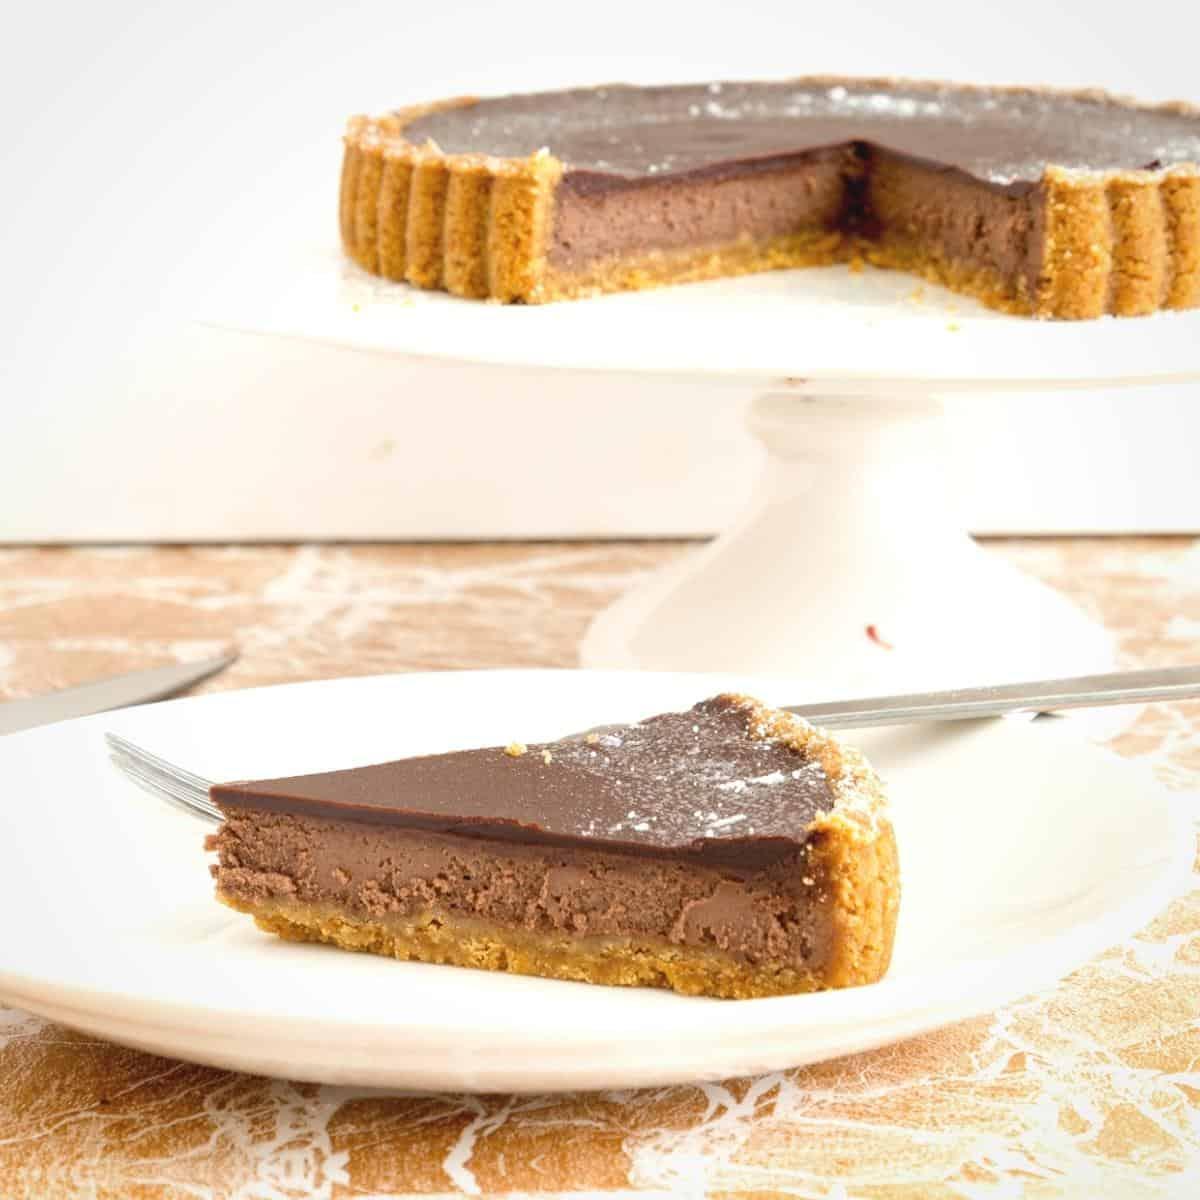 A sliced cheesecake tart with chocolate.